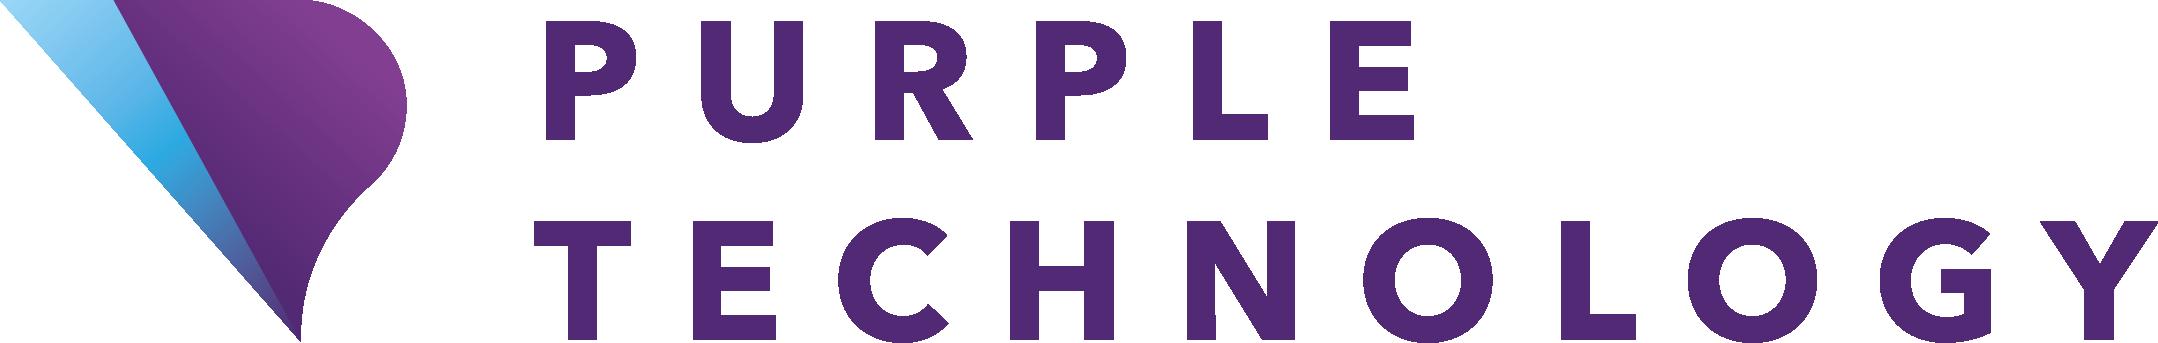 Purple Technology logo